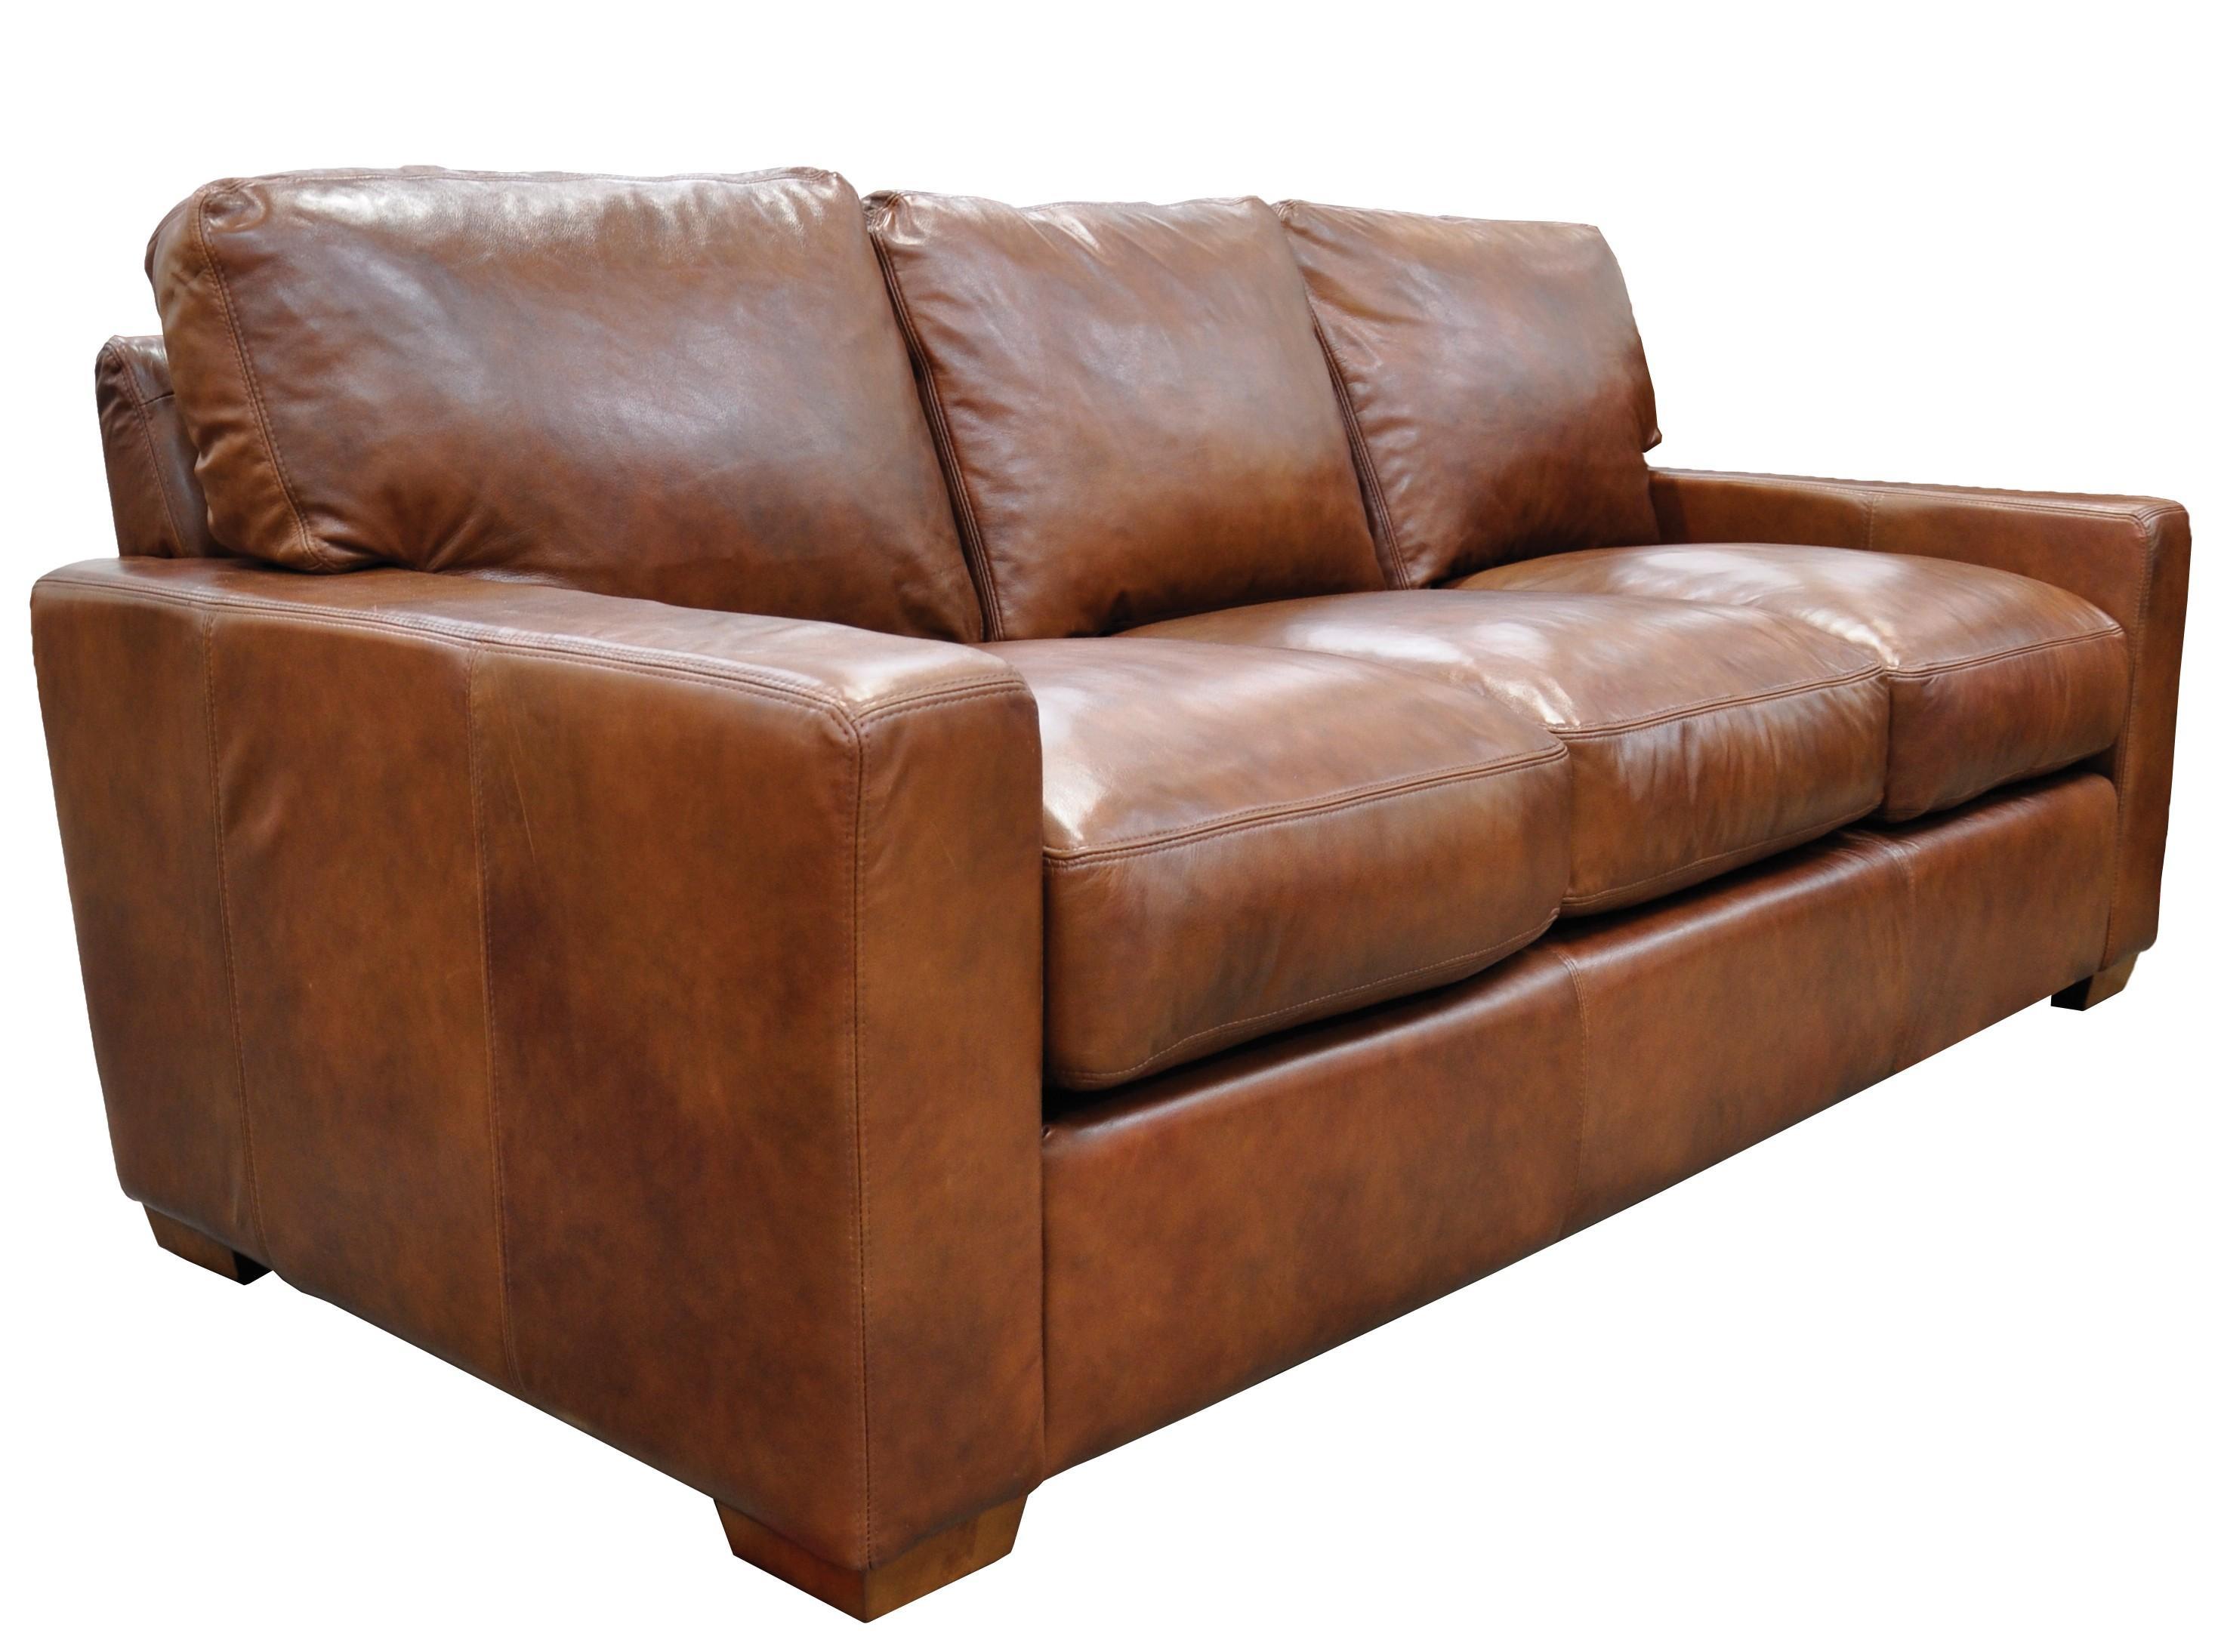 Furniture: Elegant Full Grain Leather Sofa For Luxury Living Room Inside Aniline Leather Sofas (View 12 of 20)